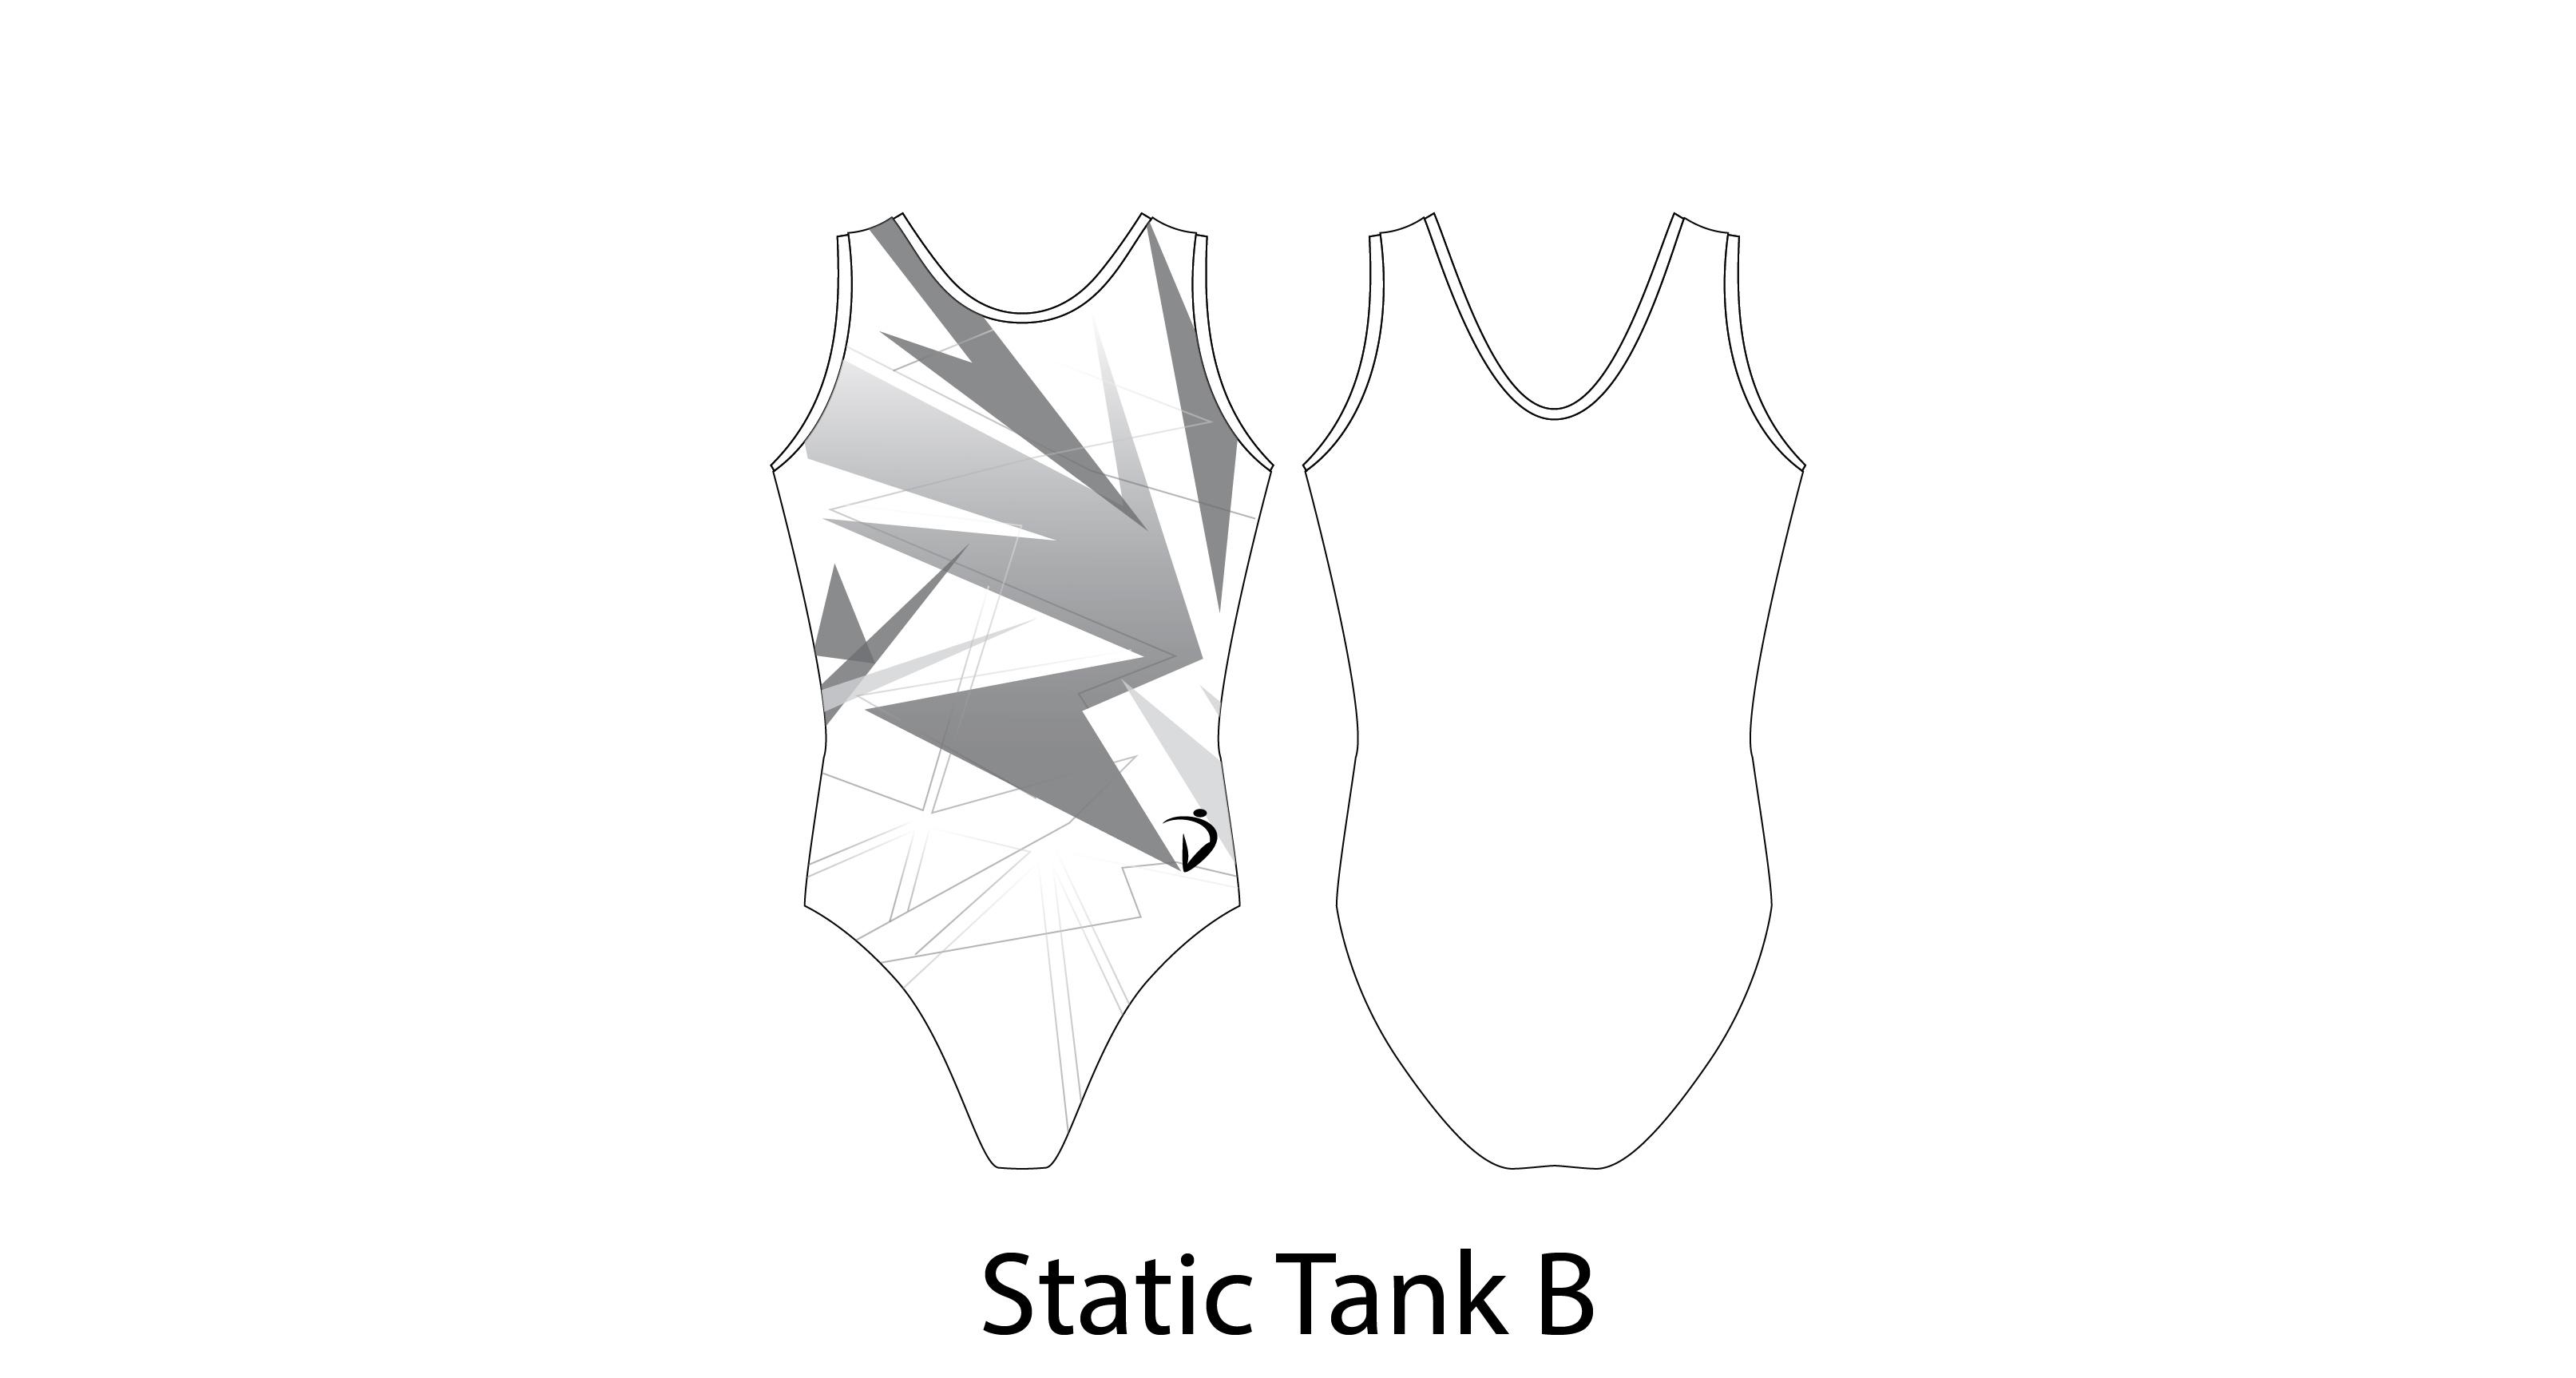 Static Tank B